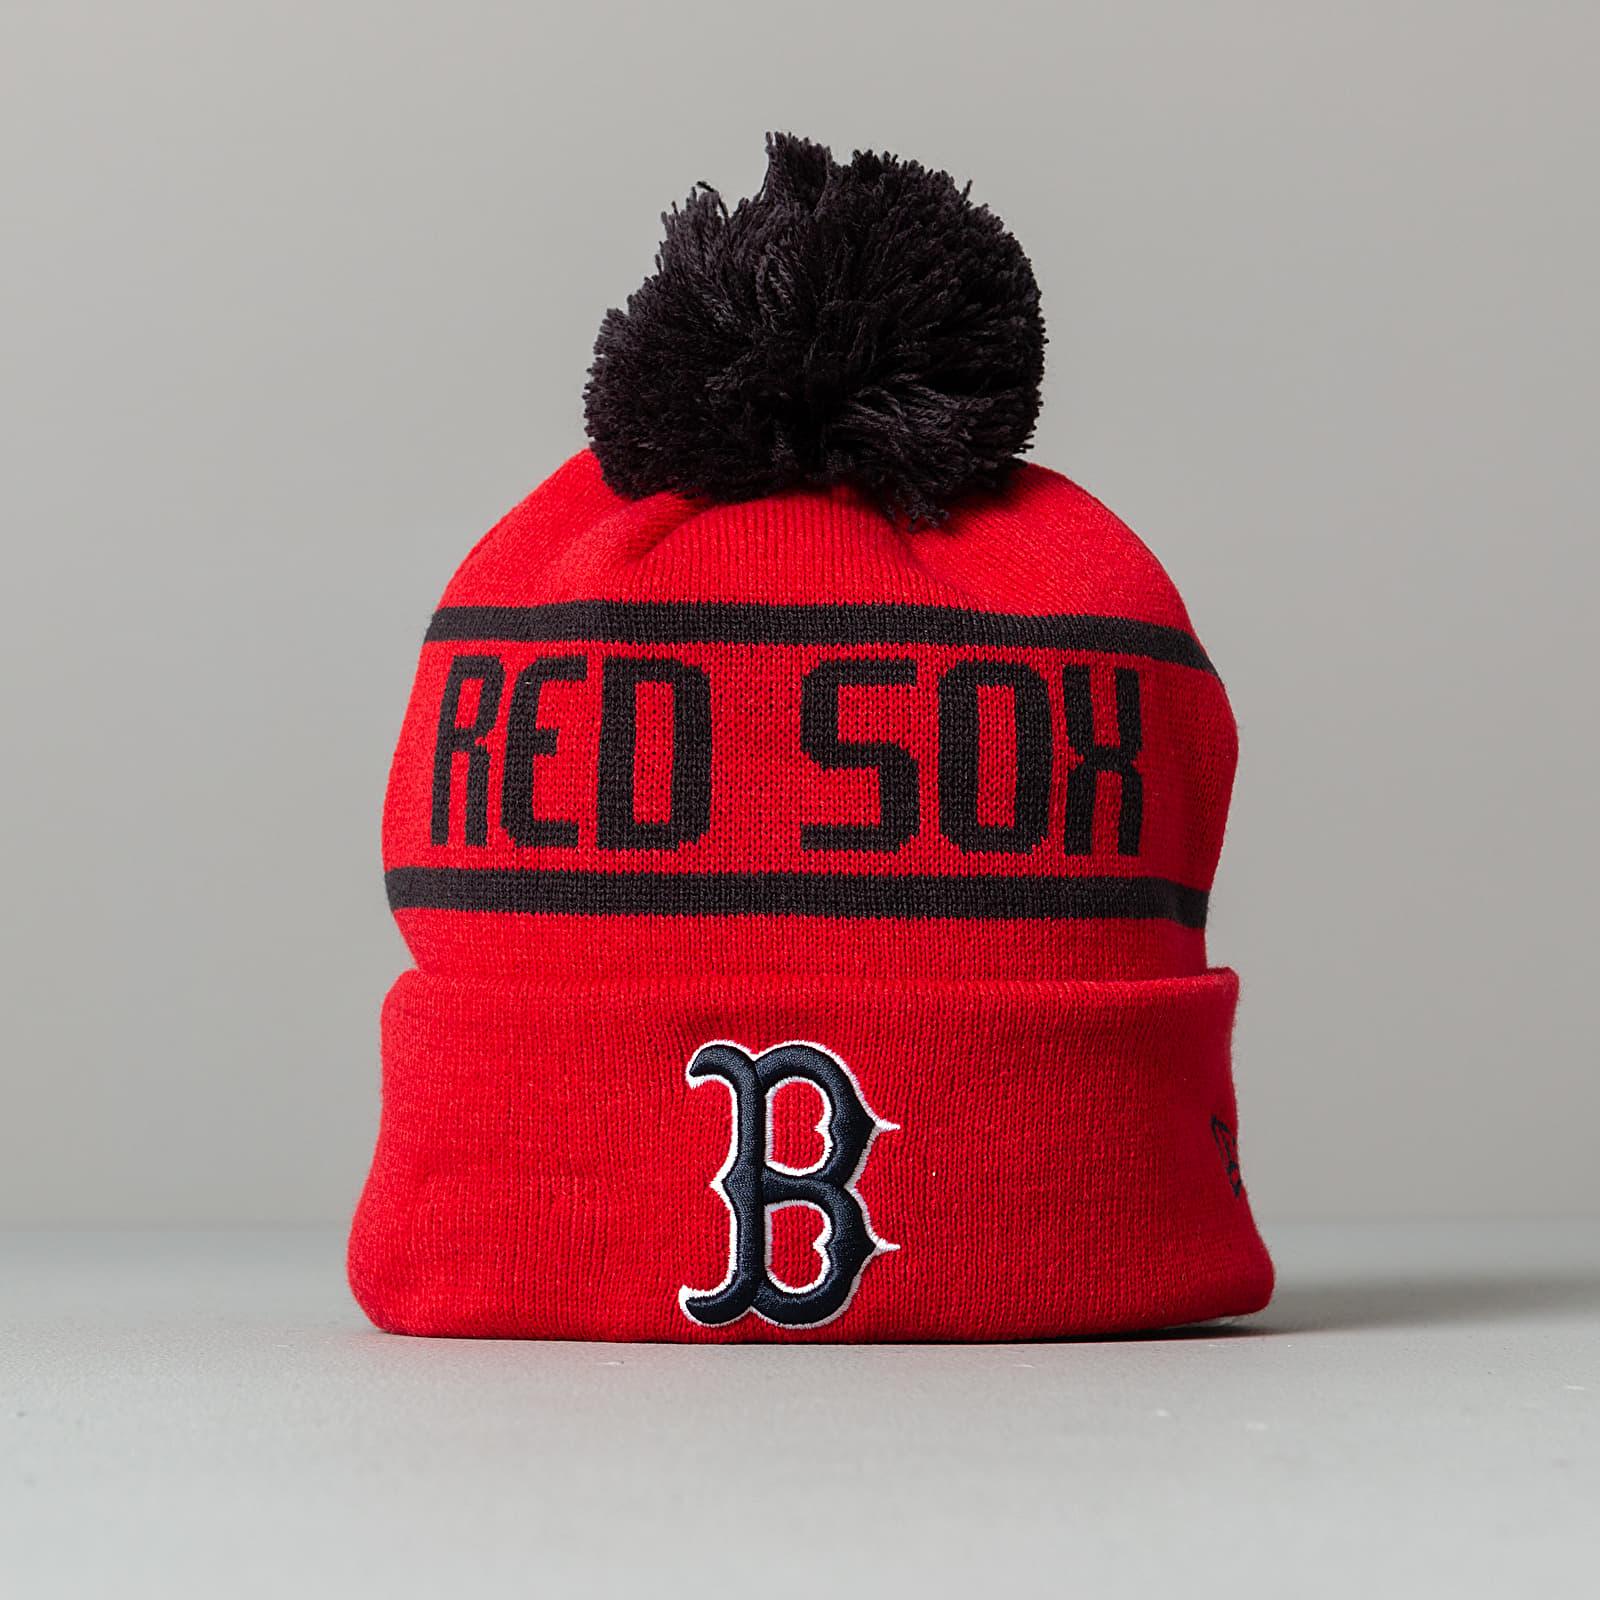 New Era MLB Bobble Knit Boston Red Sox Beanie